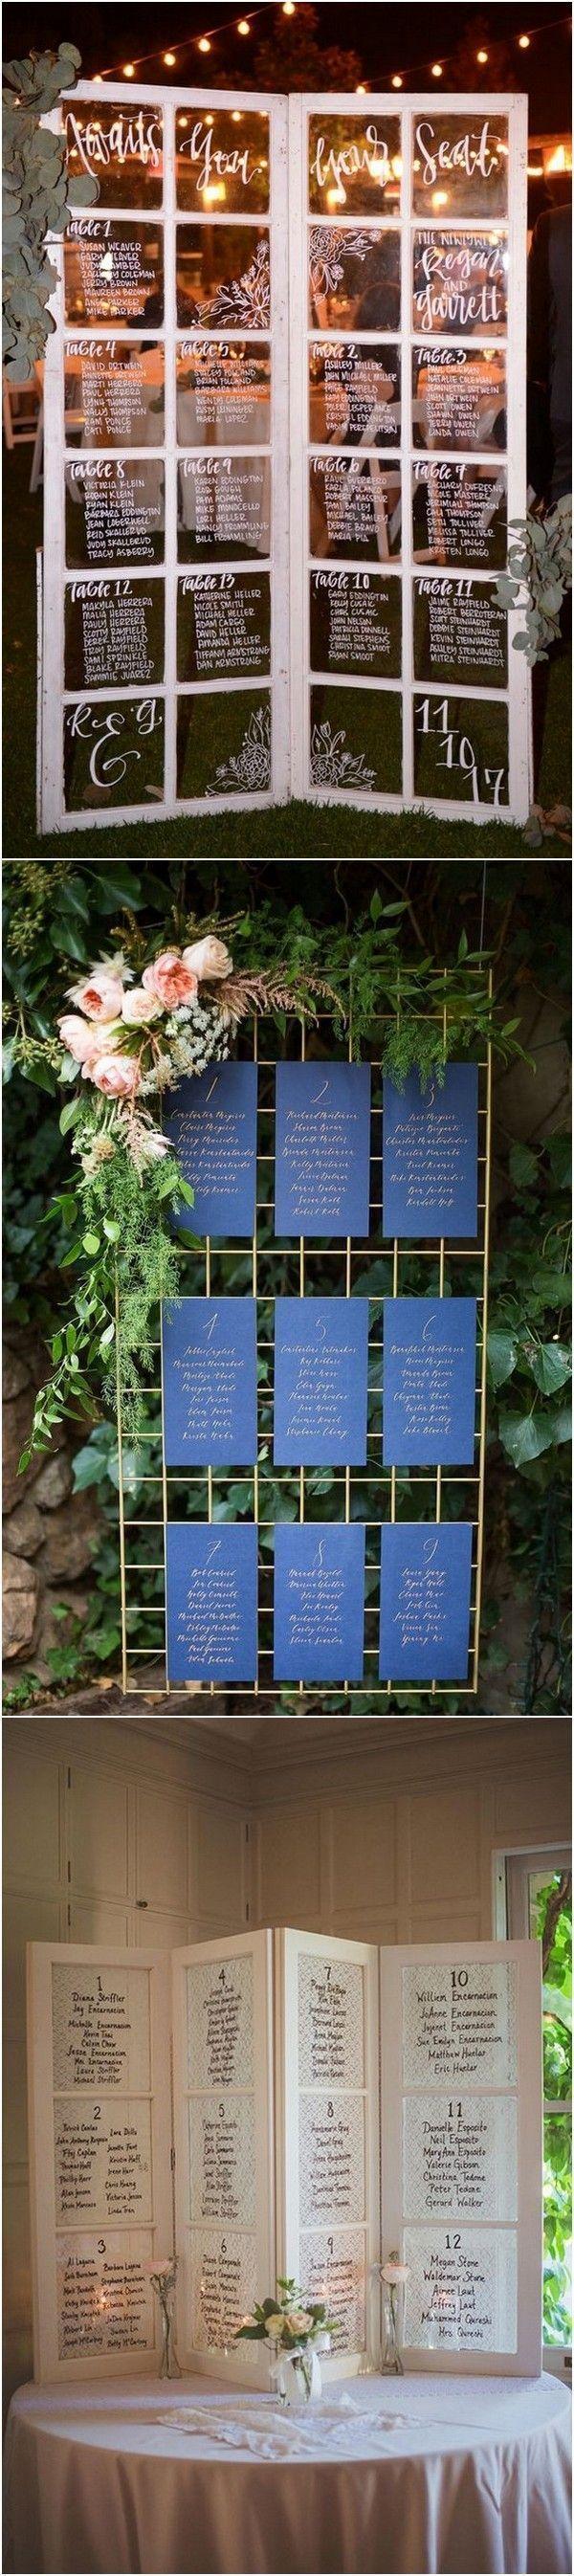 Sa wedding decor images  Trending Wedding Reception Seating Chart Ideas weddingideas